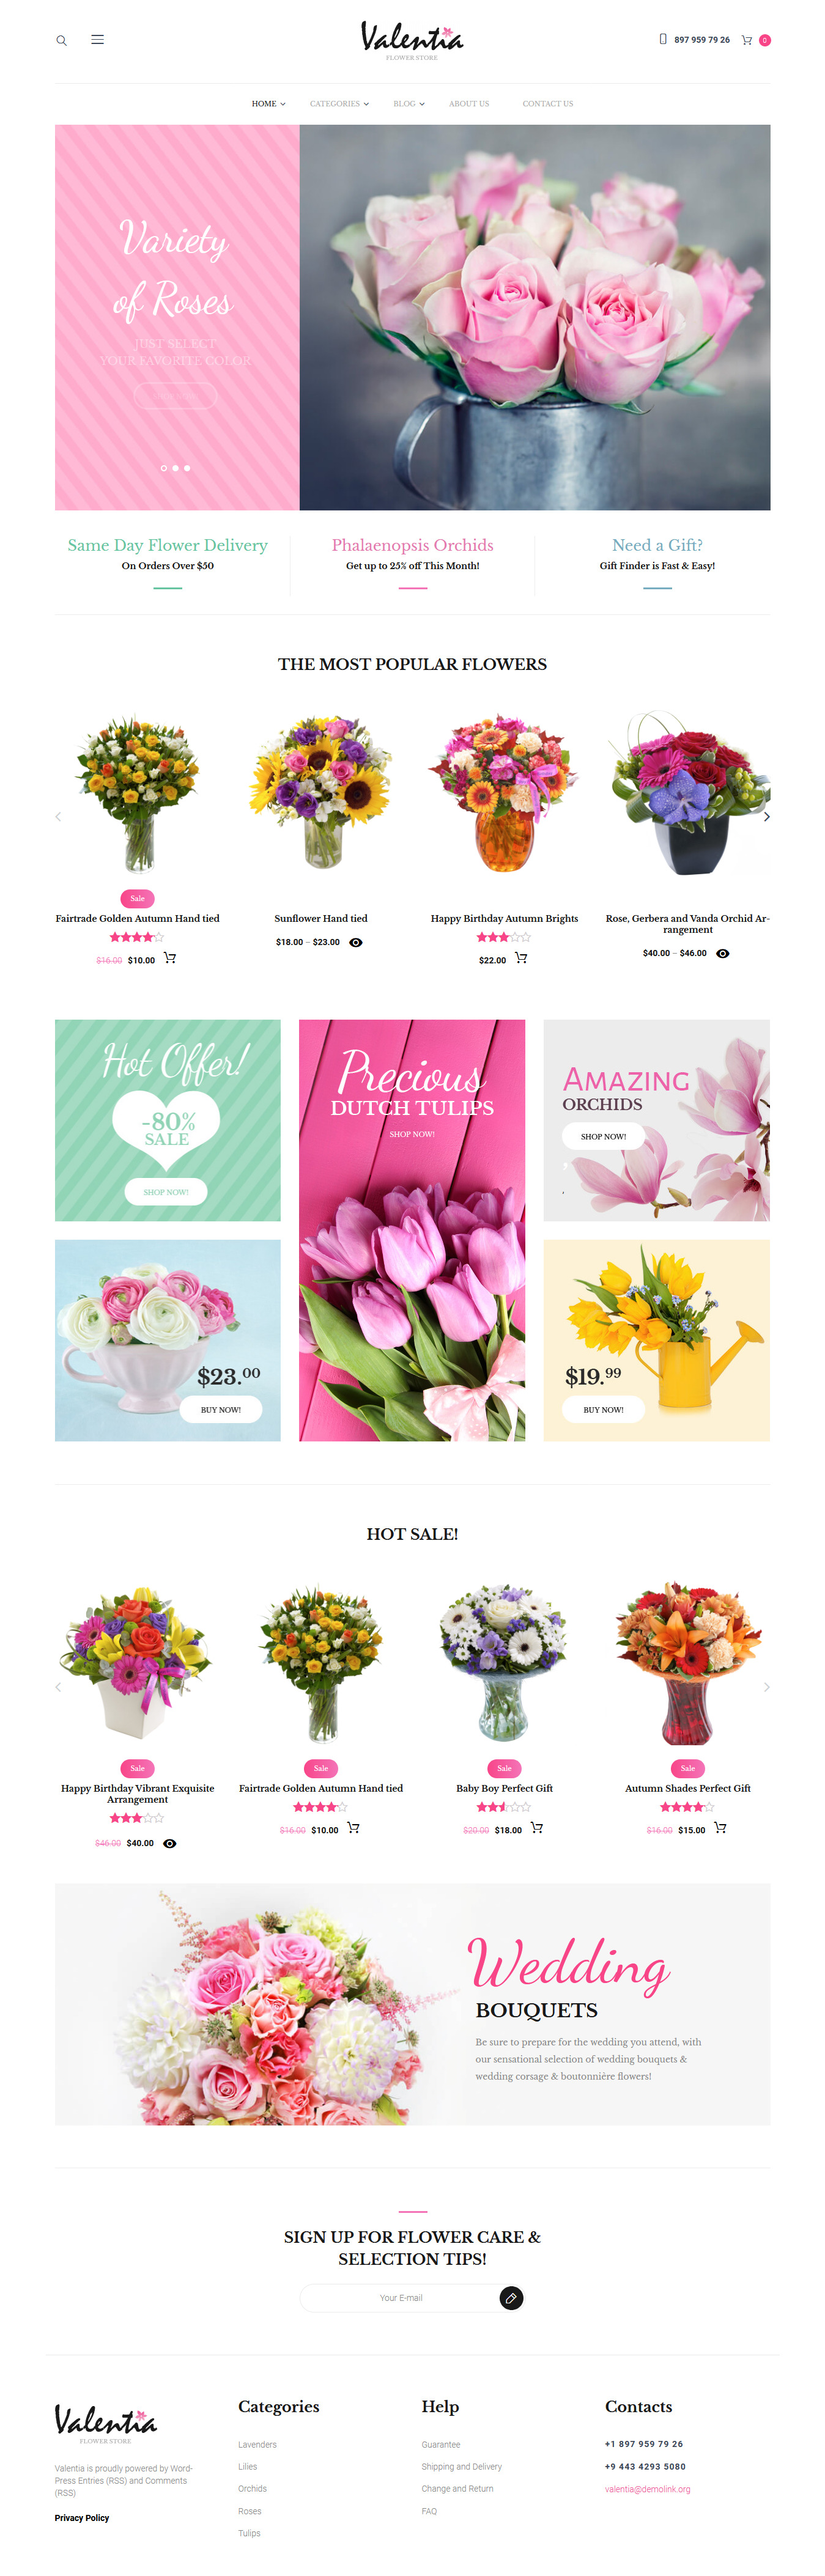 valentia best premium florist floriculture wordpress theme - 10+ Best Premium Florist and Floriculture WordPress Themes